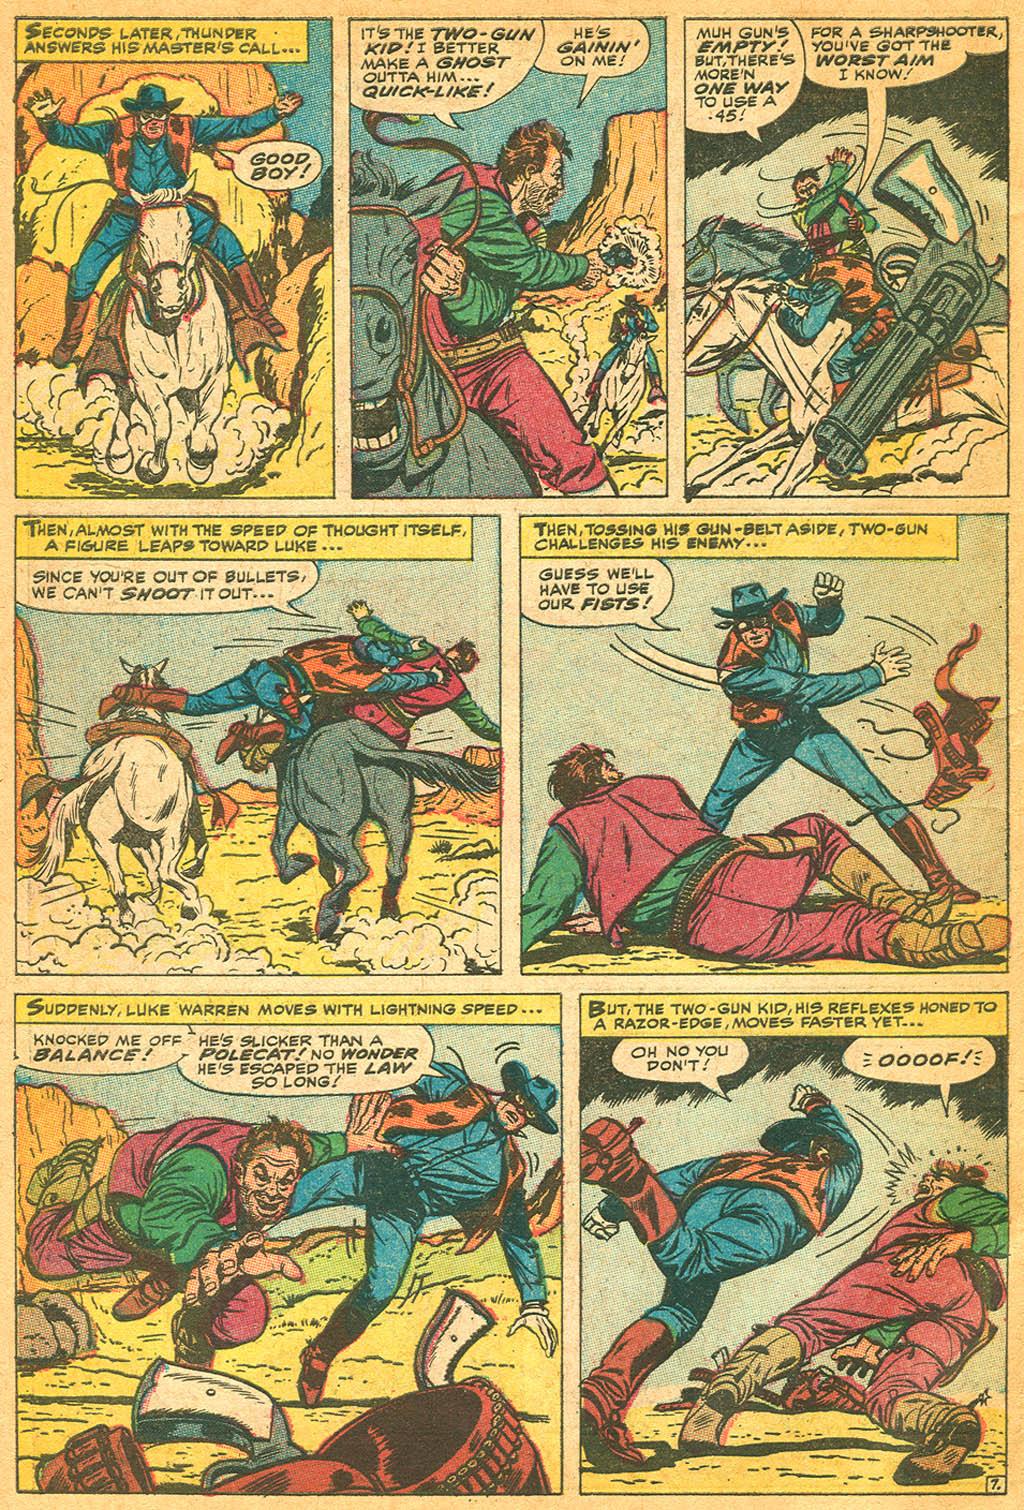 Read online Two-Gun Kid comic -  Issue #87 - 10